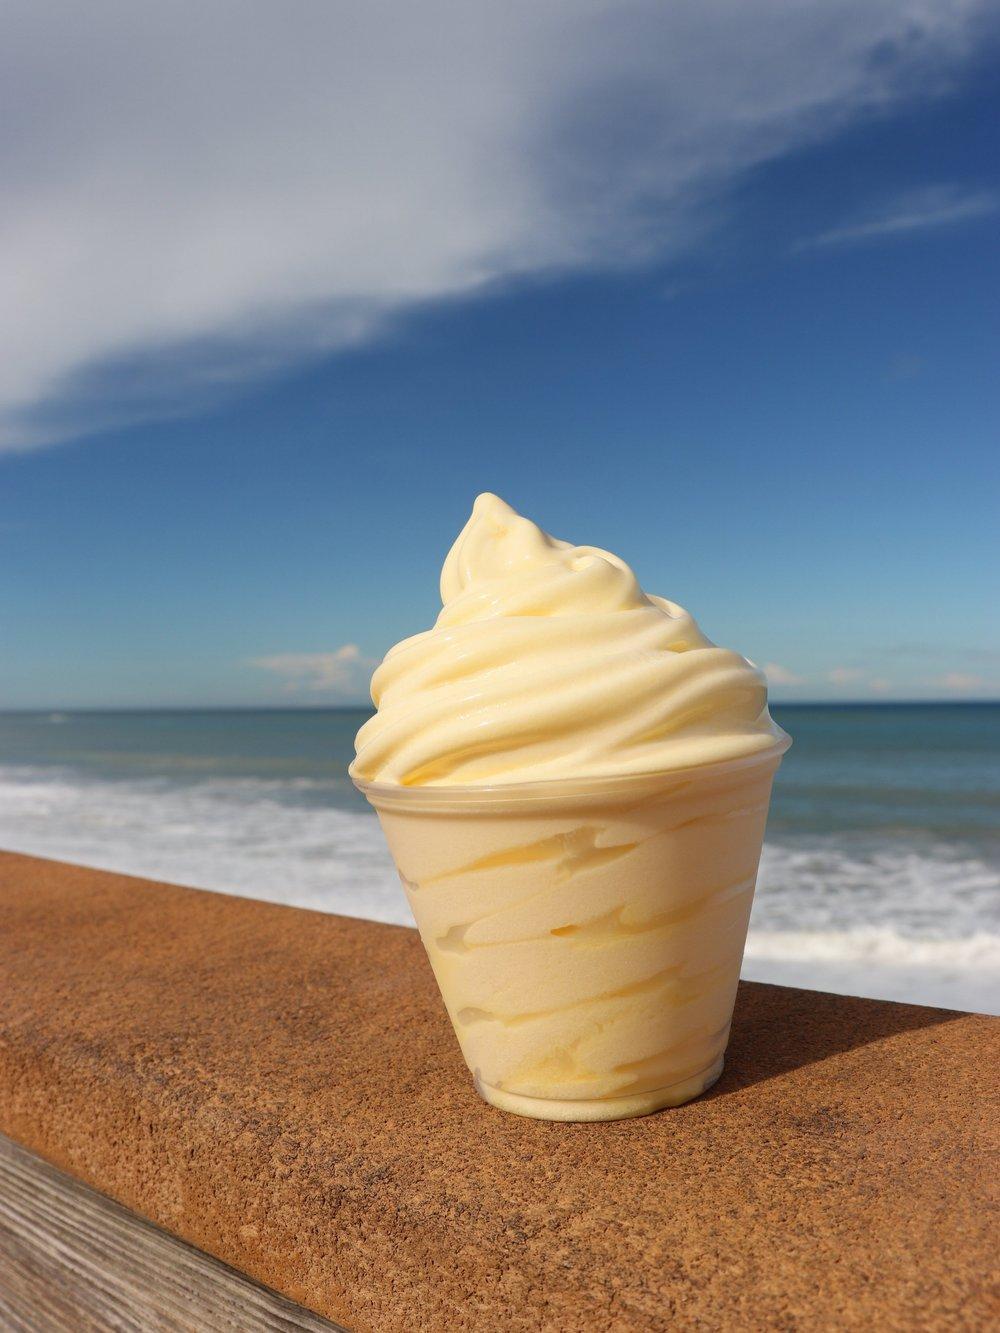 Disney Dole Whip + The Beach = Perfection